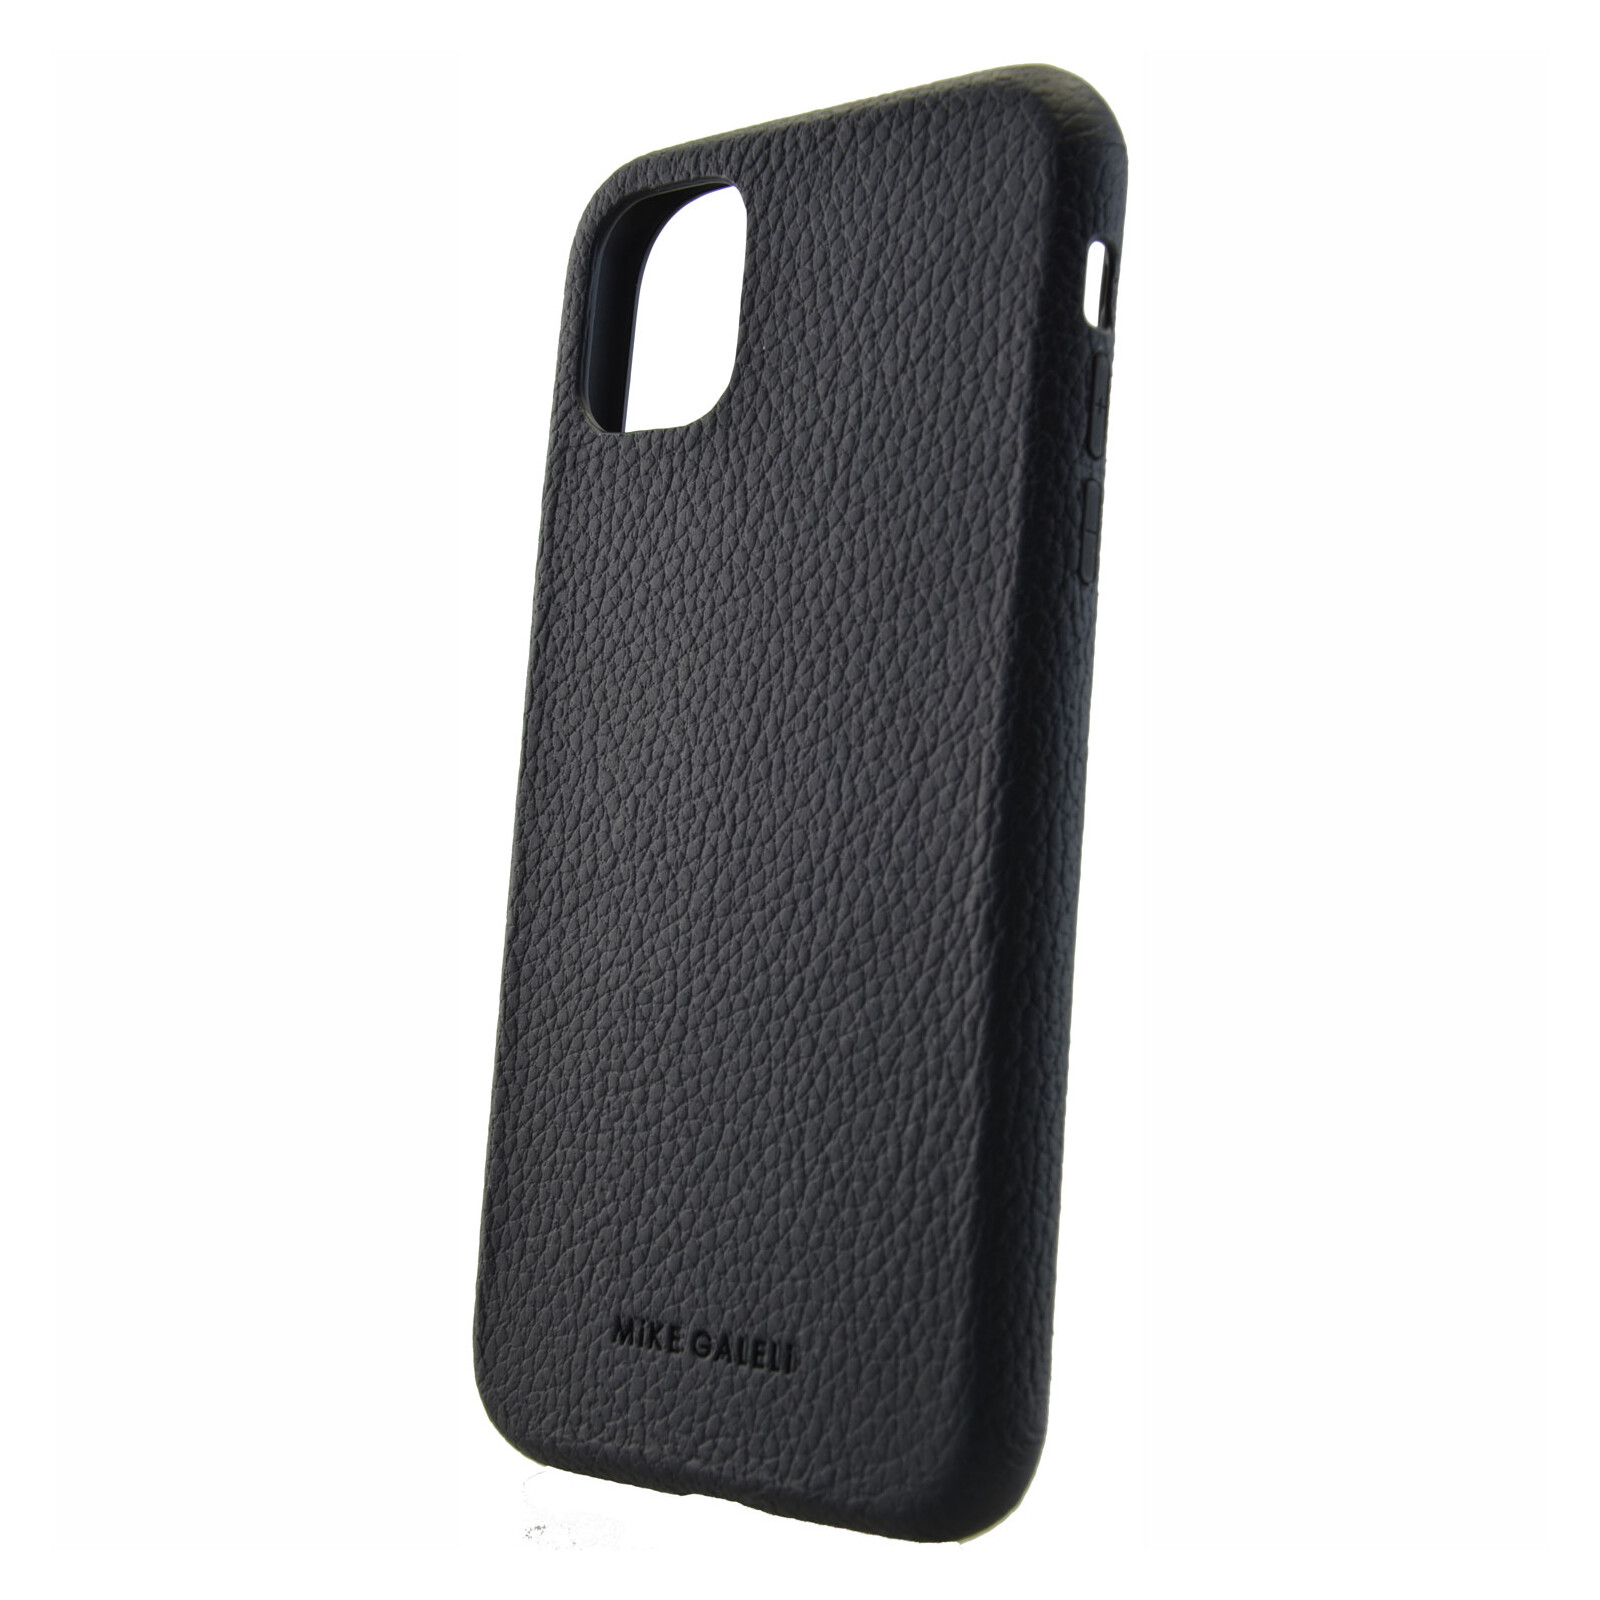 Galeli Backcover FINN Apple iPhone 12 schwarz